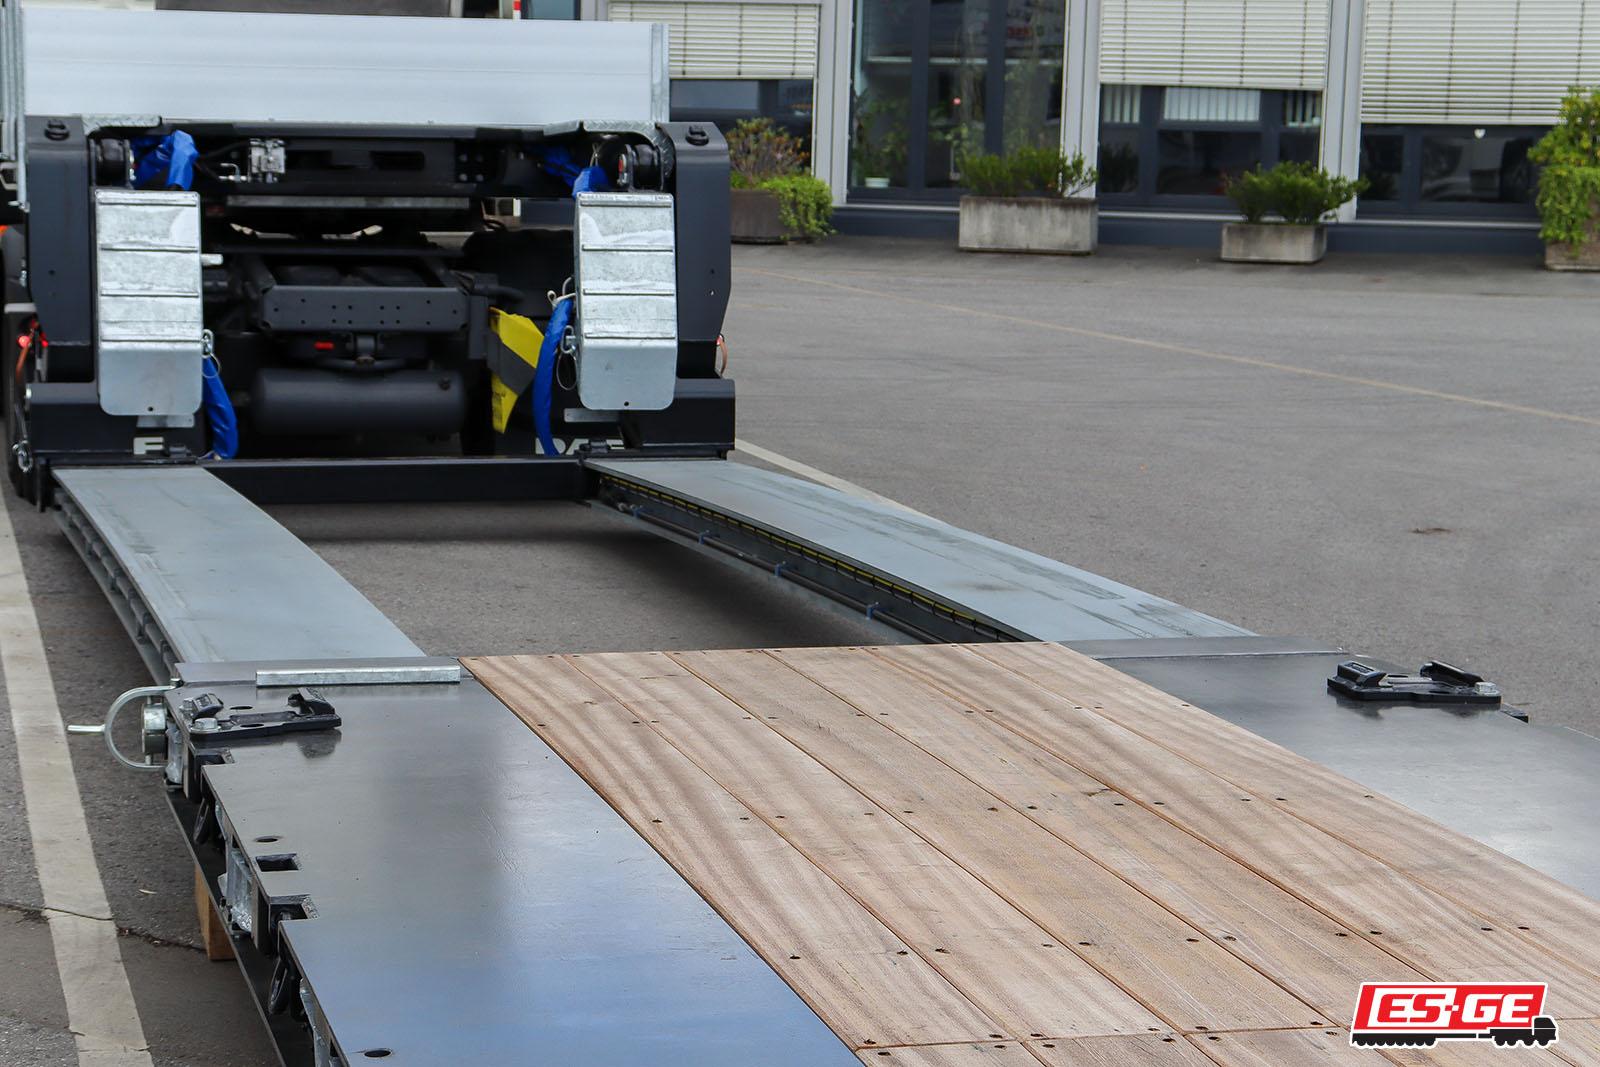 MAX-Trailer-MAX510-NEU-ES-GE-Oldenburger-4